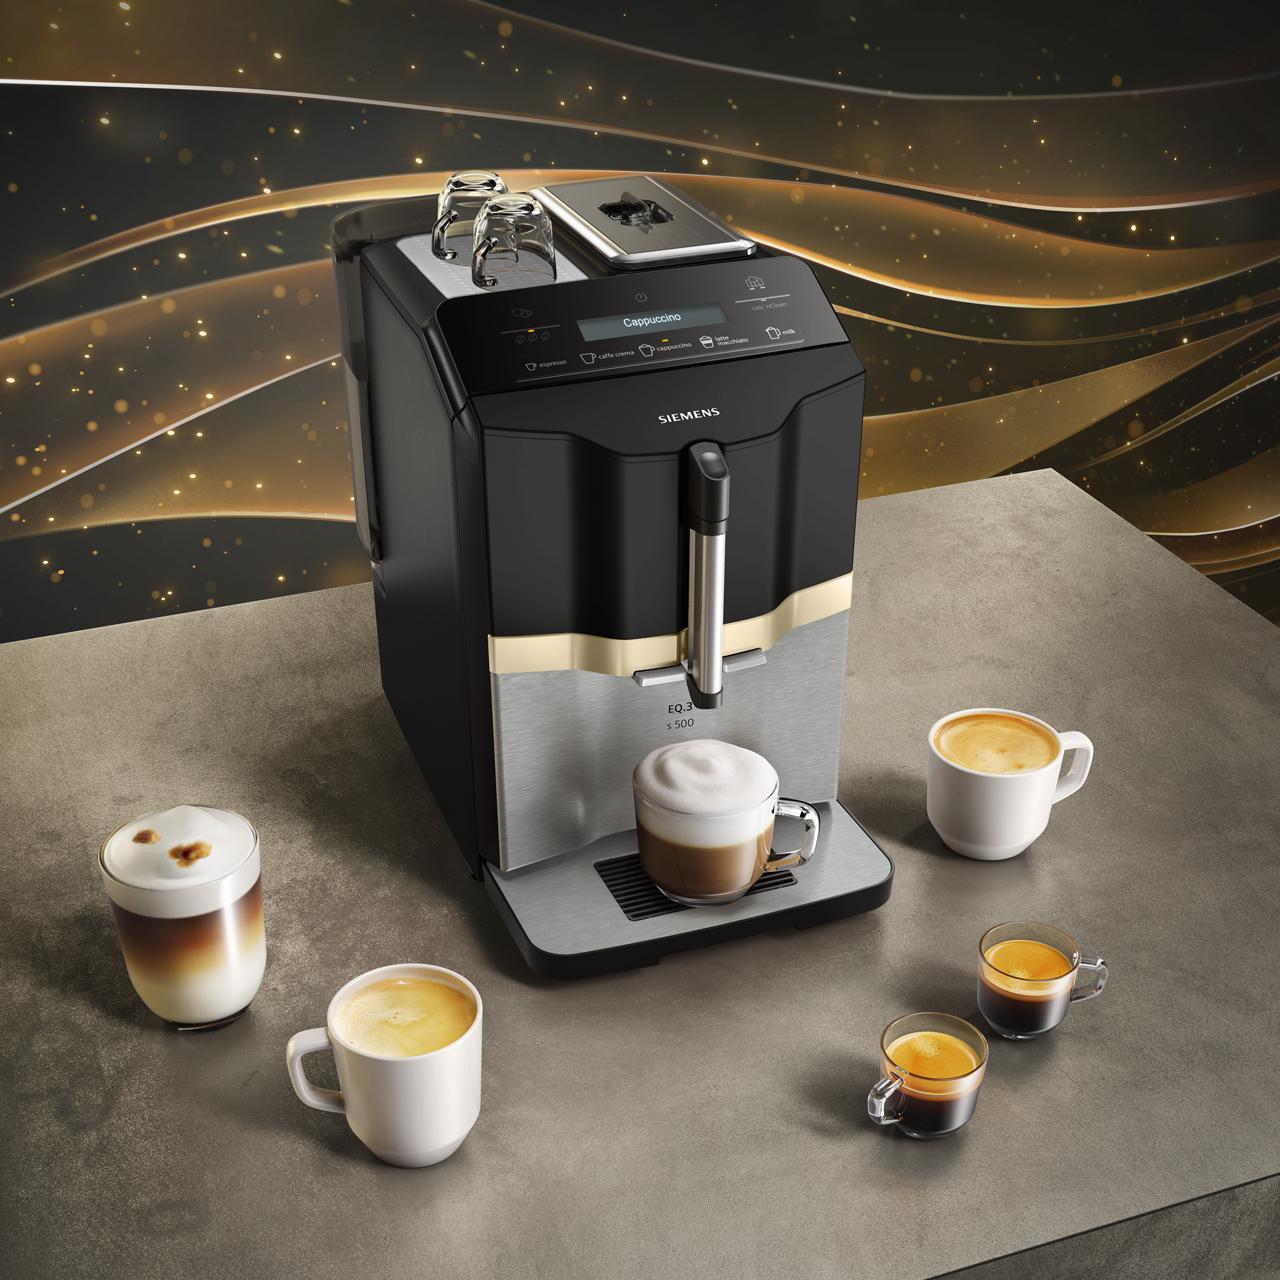 Siemens Eq3 Ti305206rw Bean To Cup Coffee Machine Black Stainless Steel